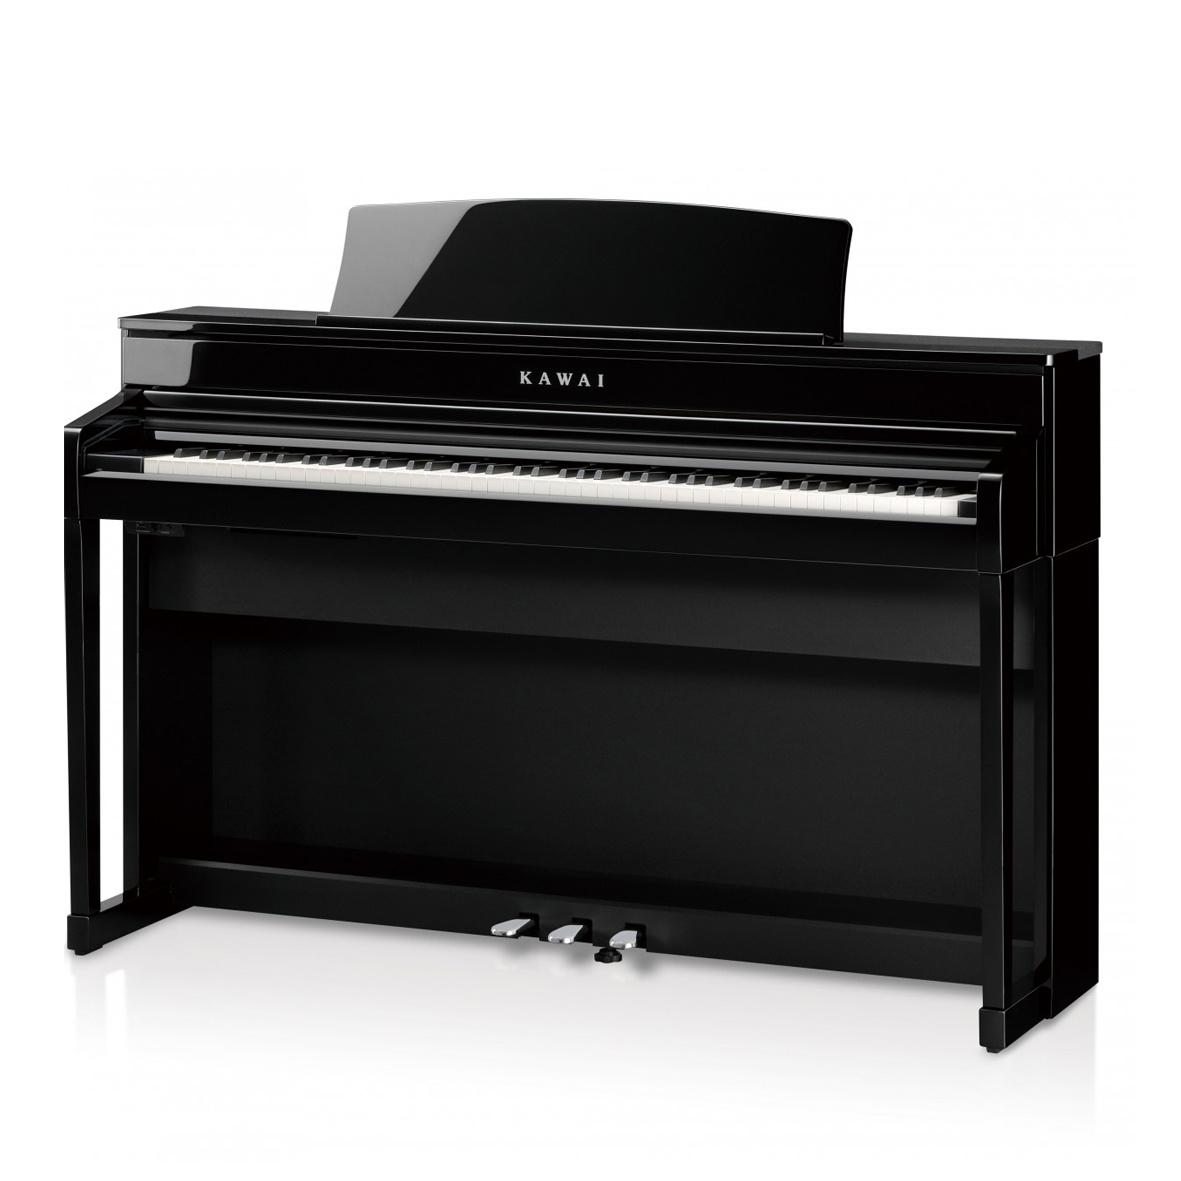 Kawai - Digital und E Piano Kawai CA 79 BK